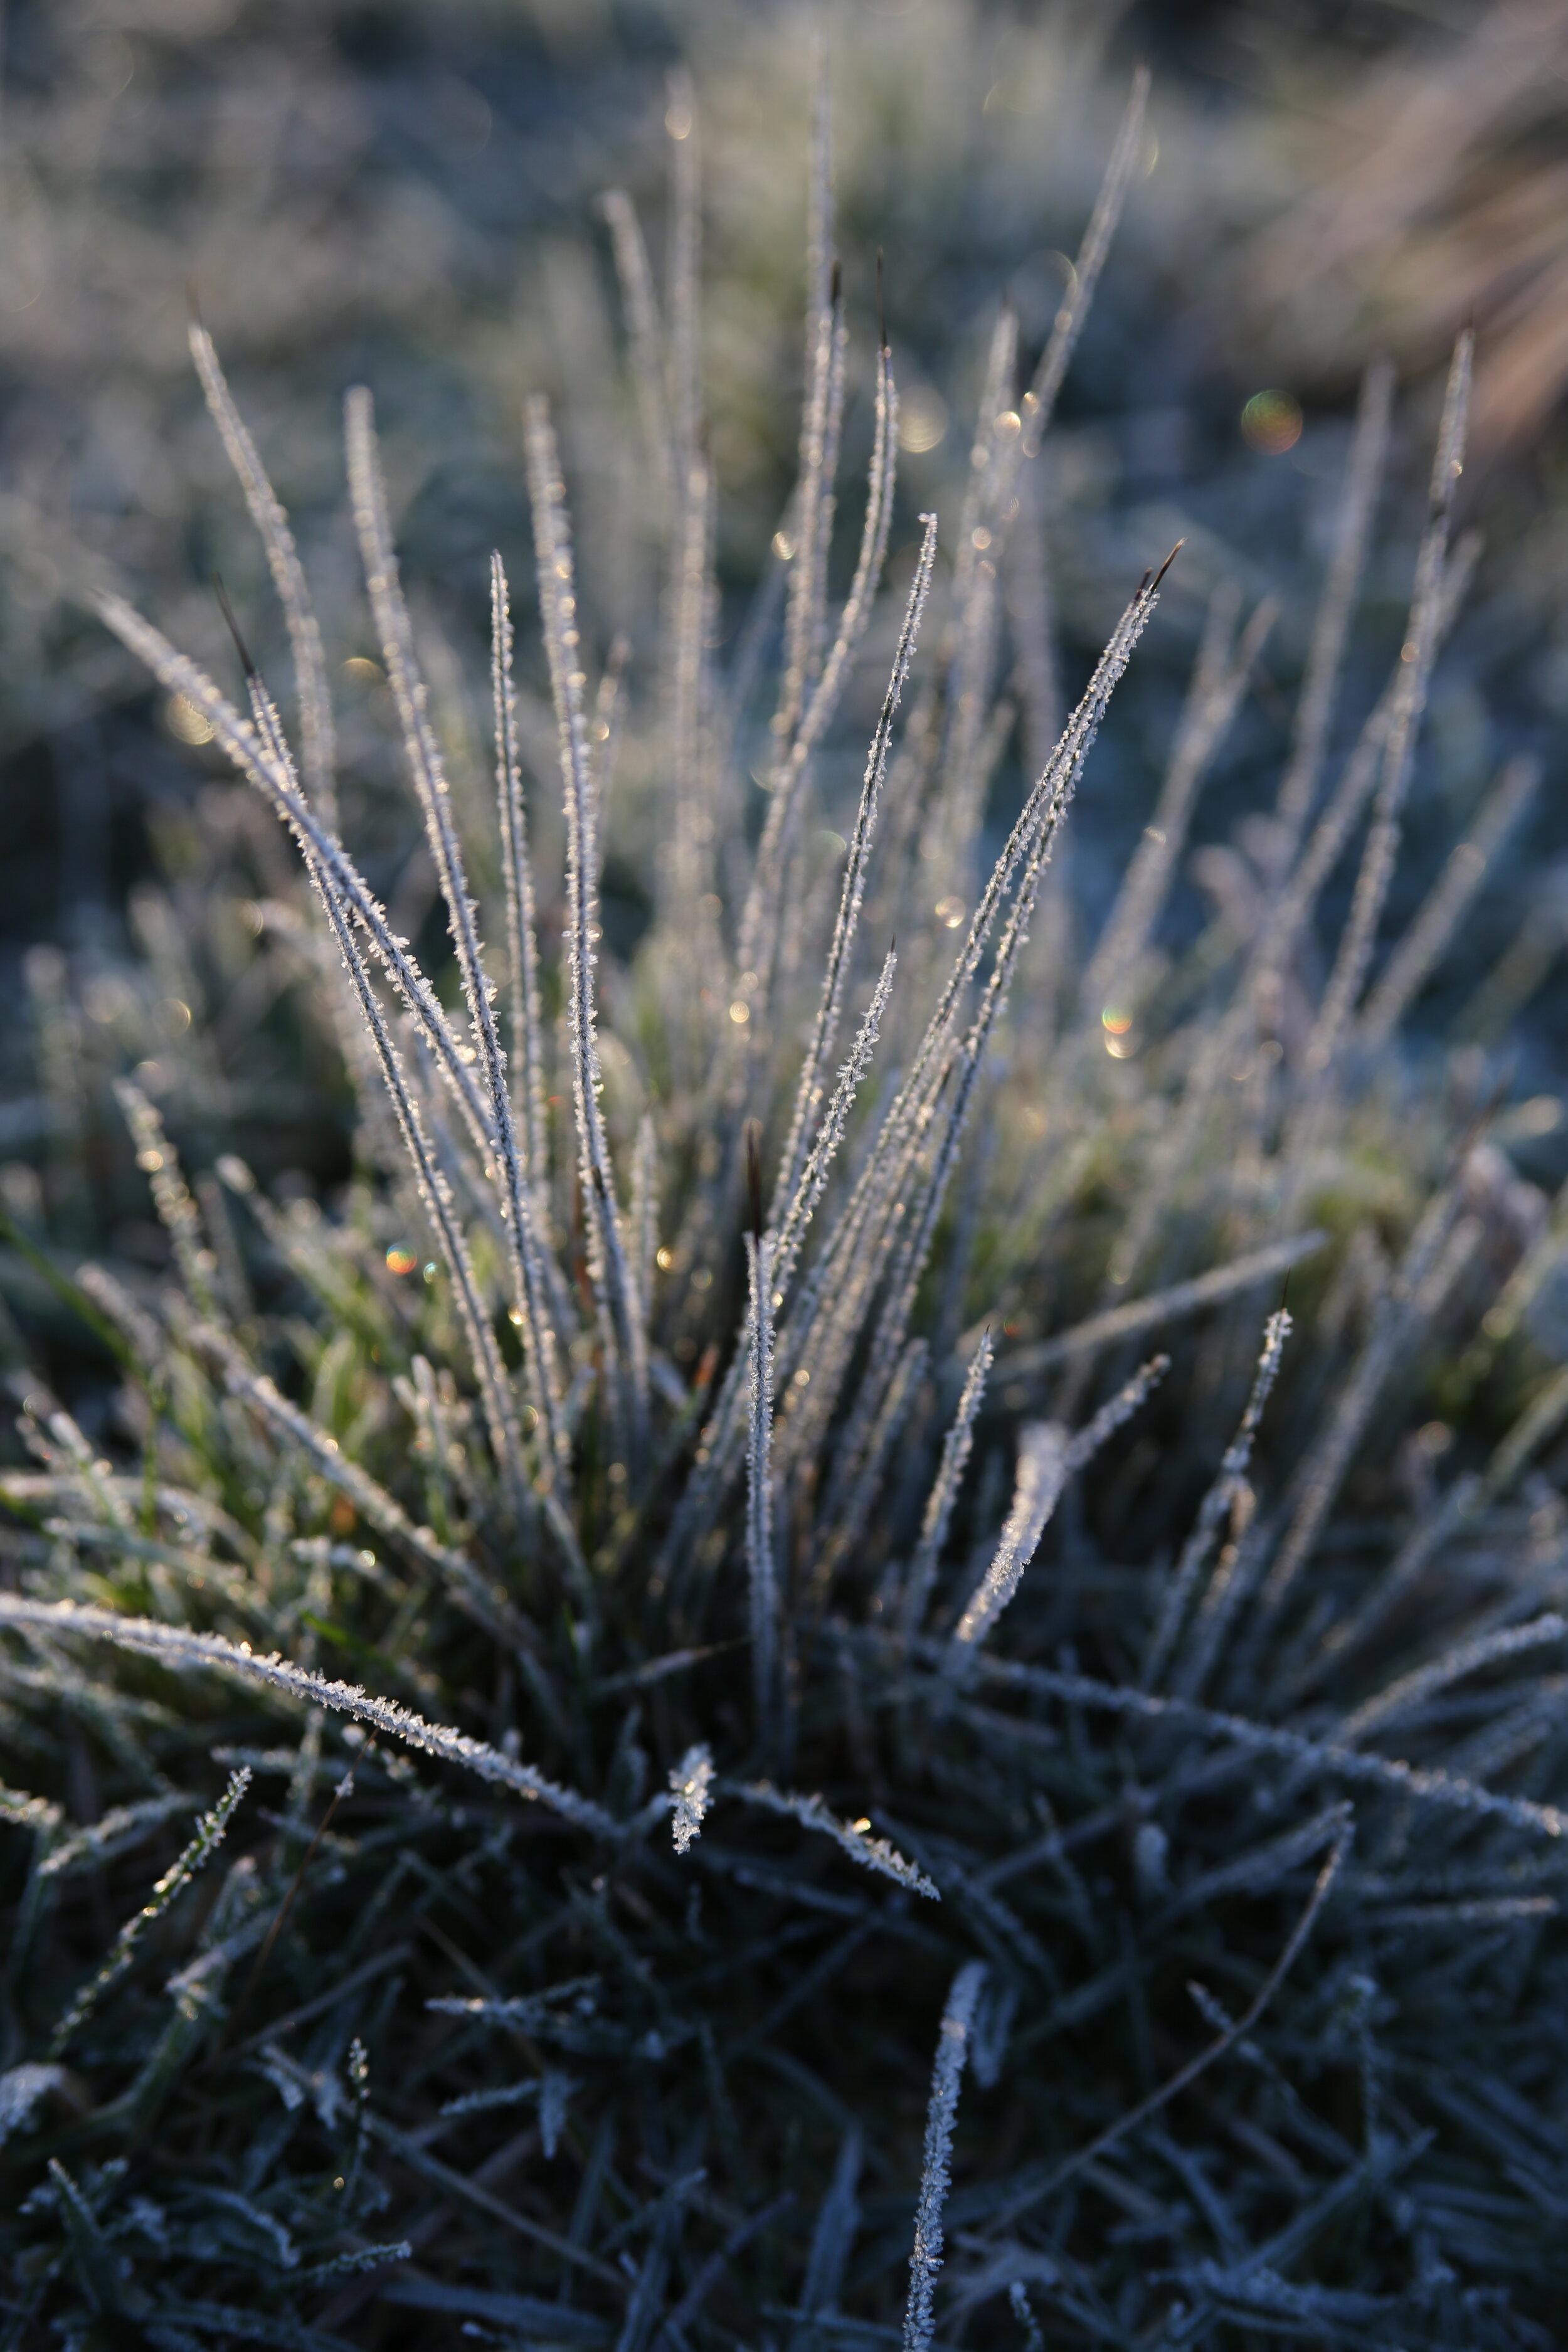 Frosty Grass clump copy.jpeg